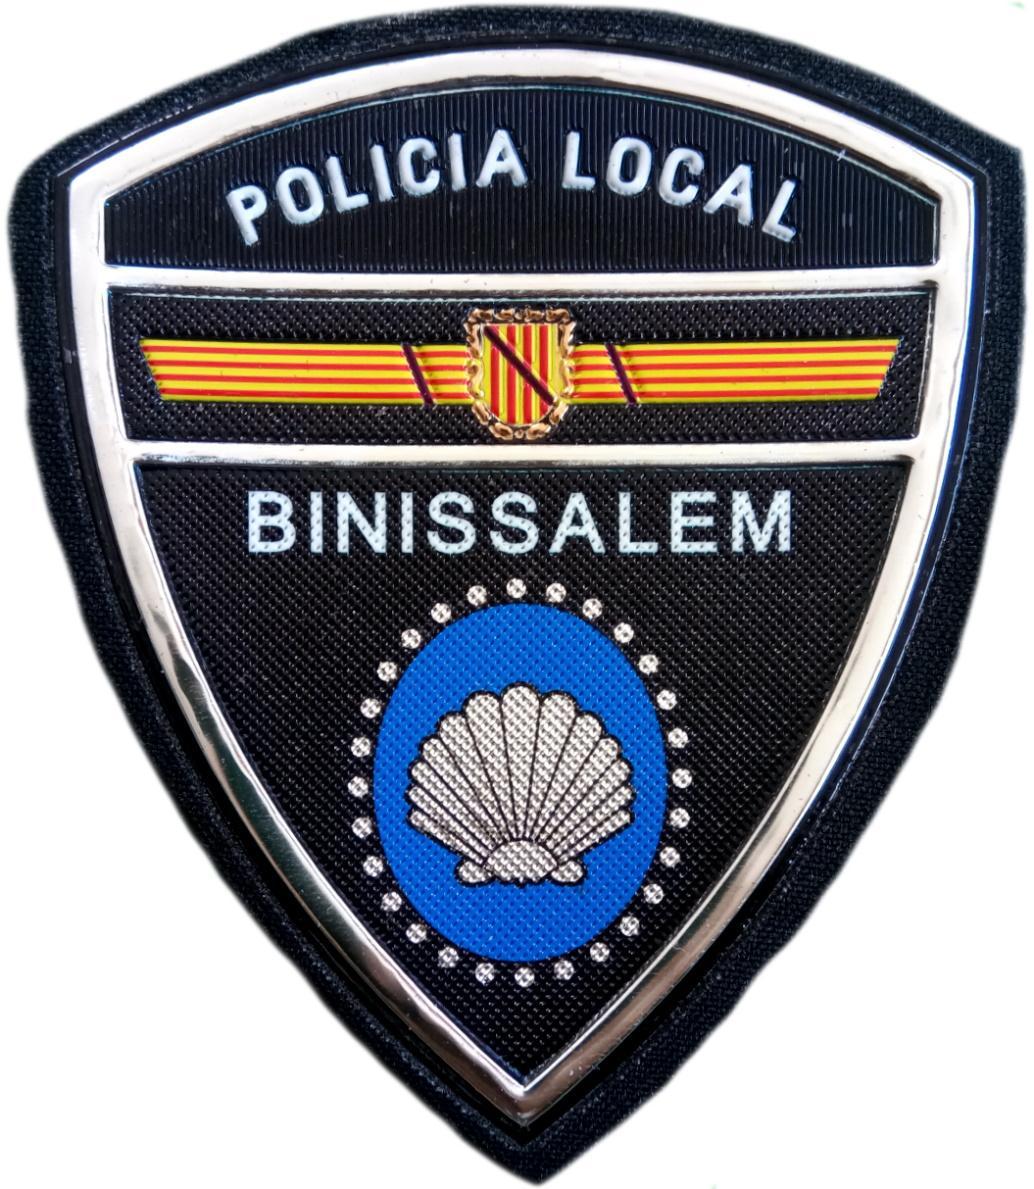 Policía Local Binissalem parche insignia emblema distintivo